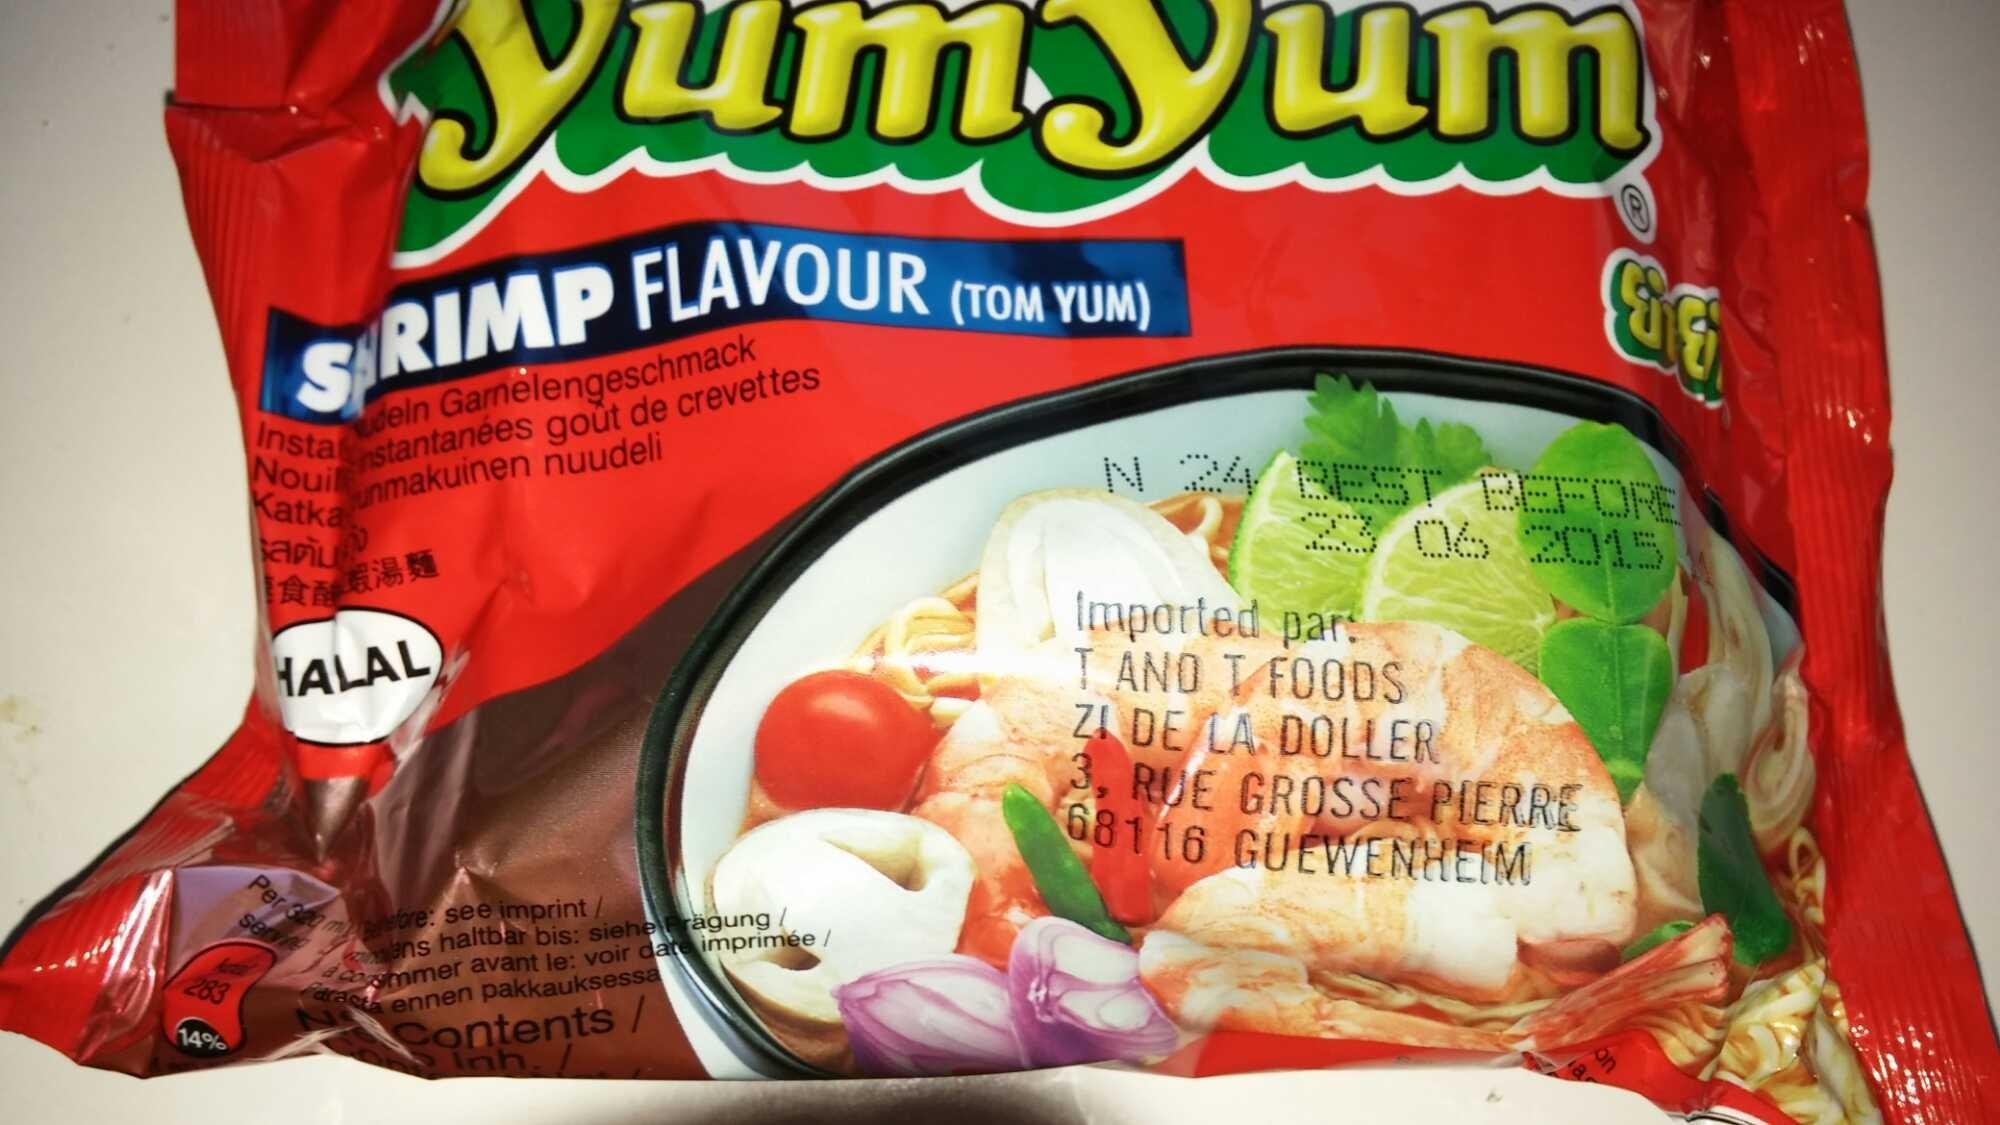 yum yum Asian Cuisine Shrimp Flavour - Prodotto